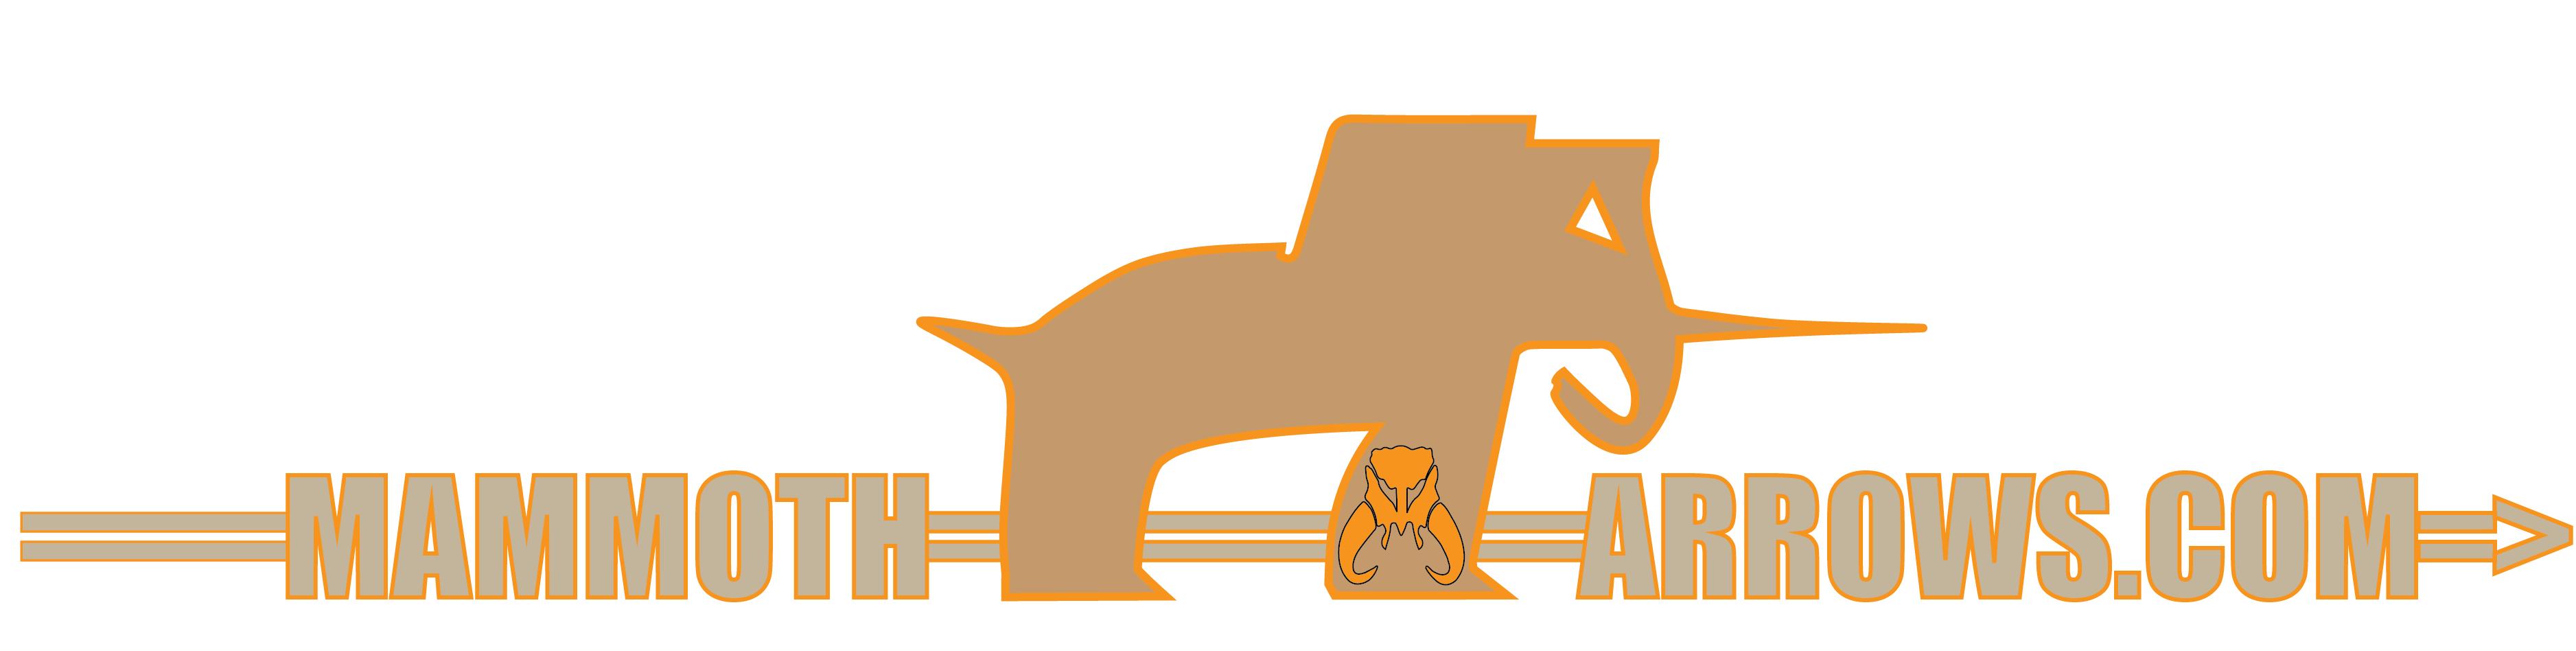 logo-mammoth.png